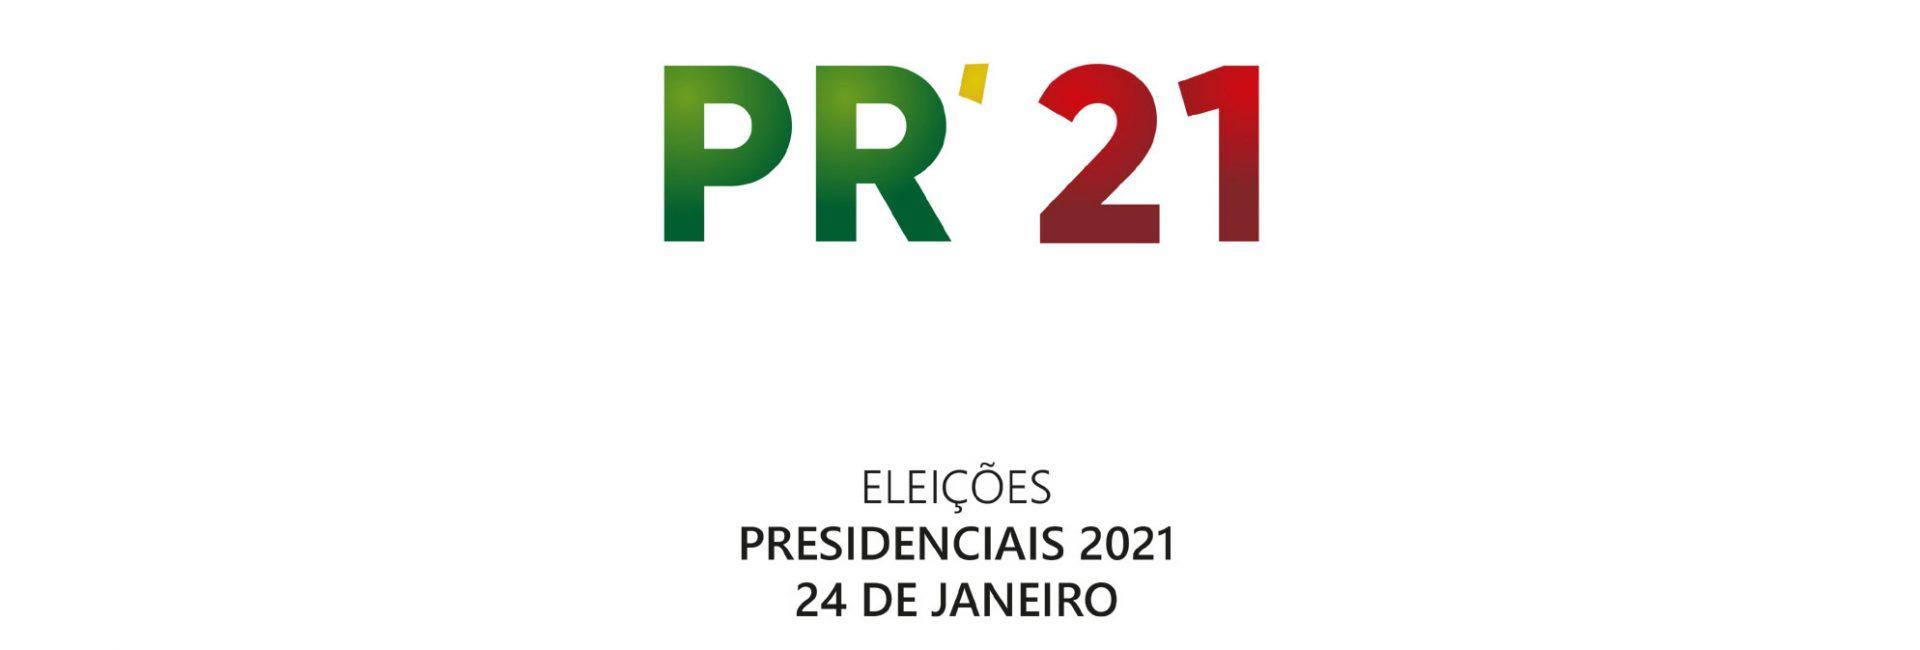 presidenciais2